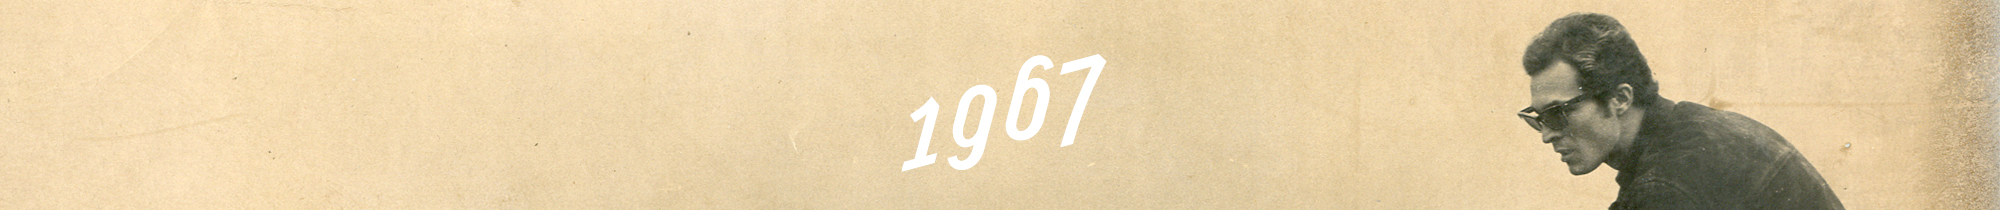 petit-slider-brochure-1967b